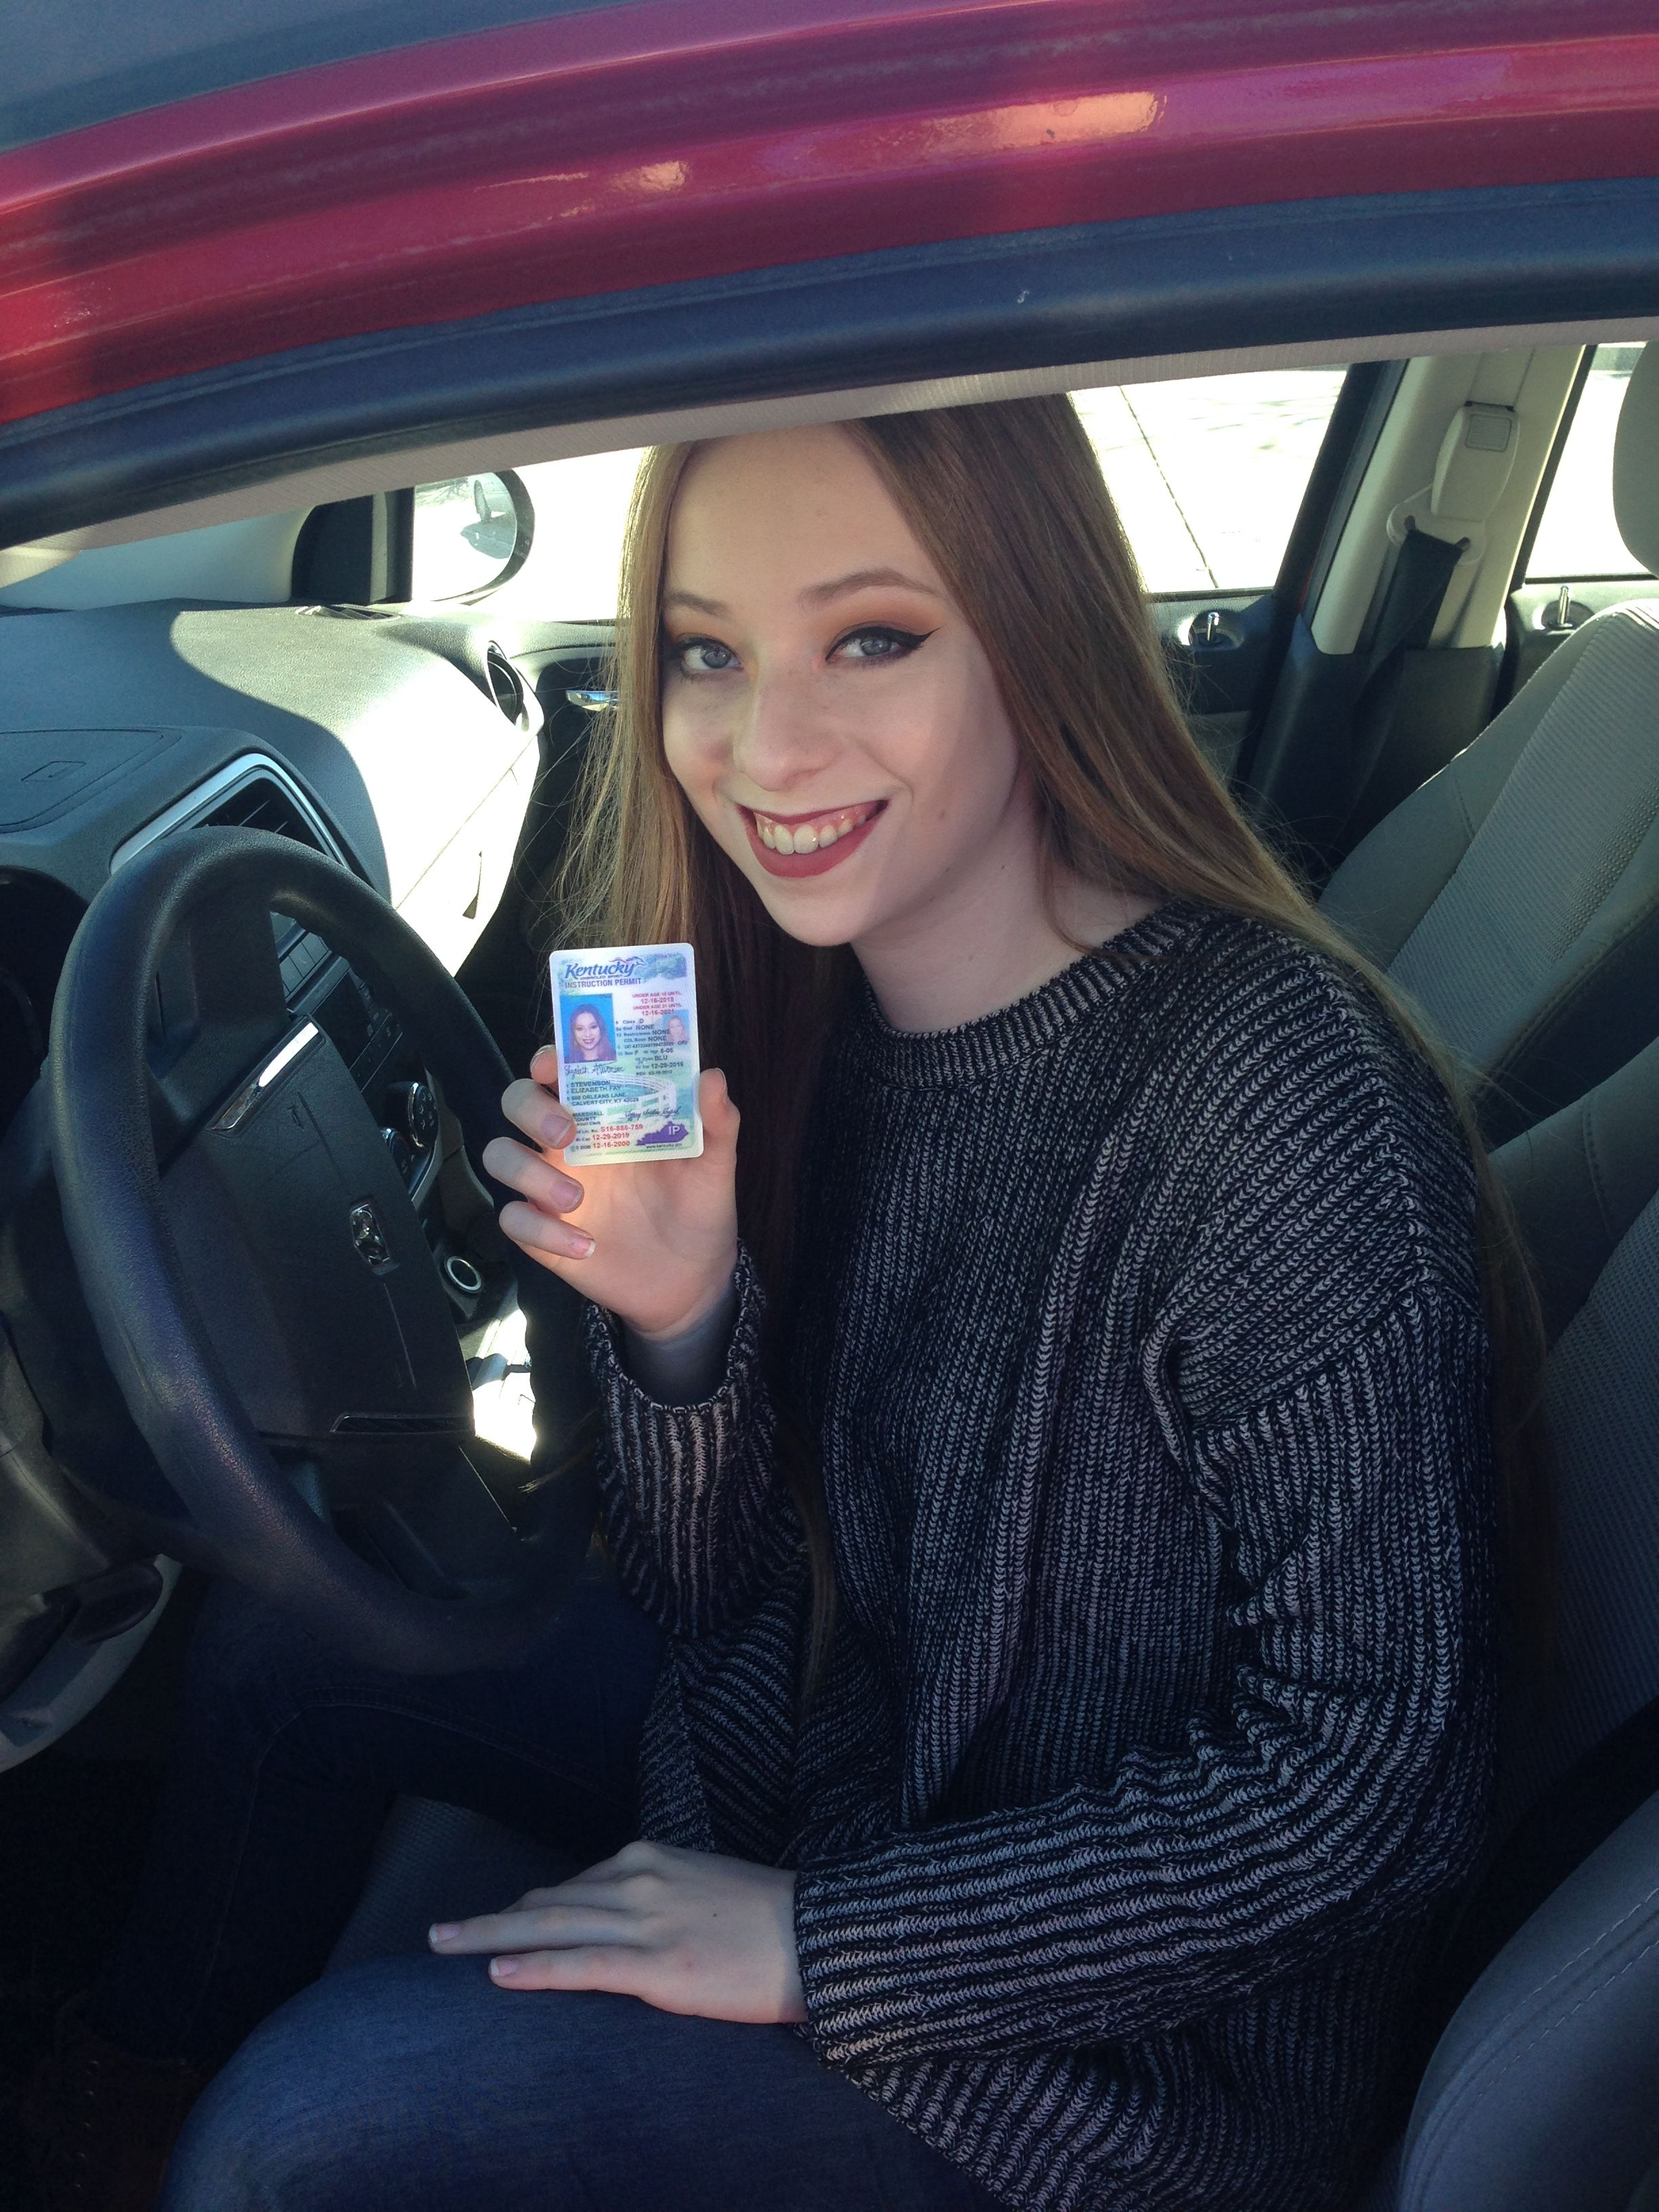 Drivers permit december 29 2016 drivers permit